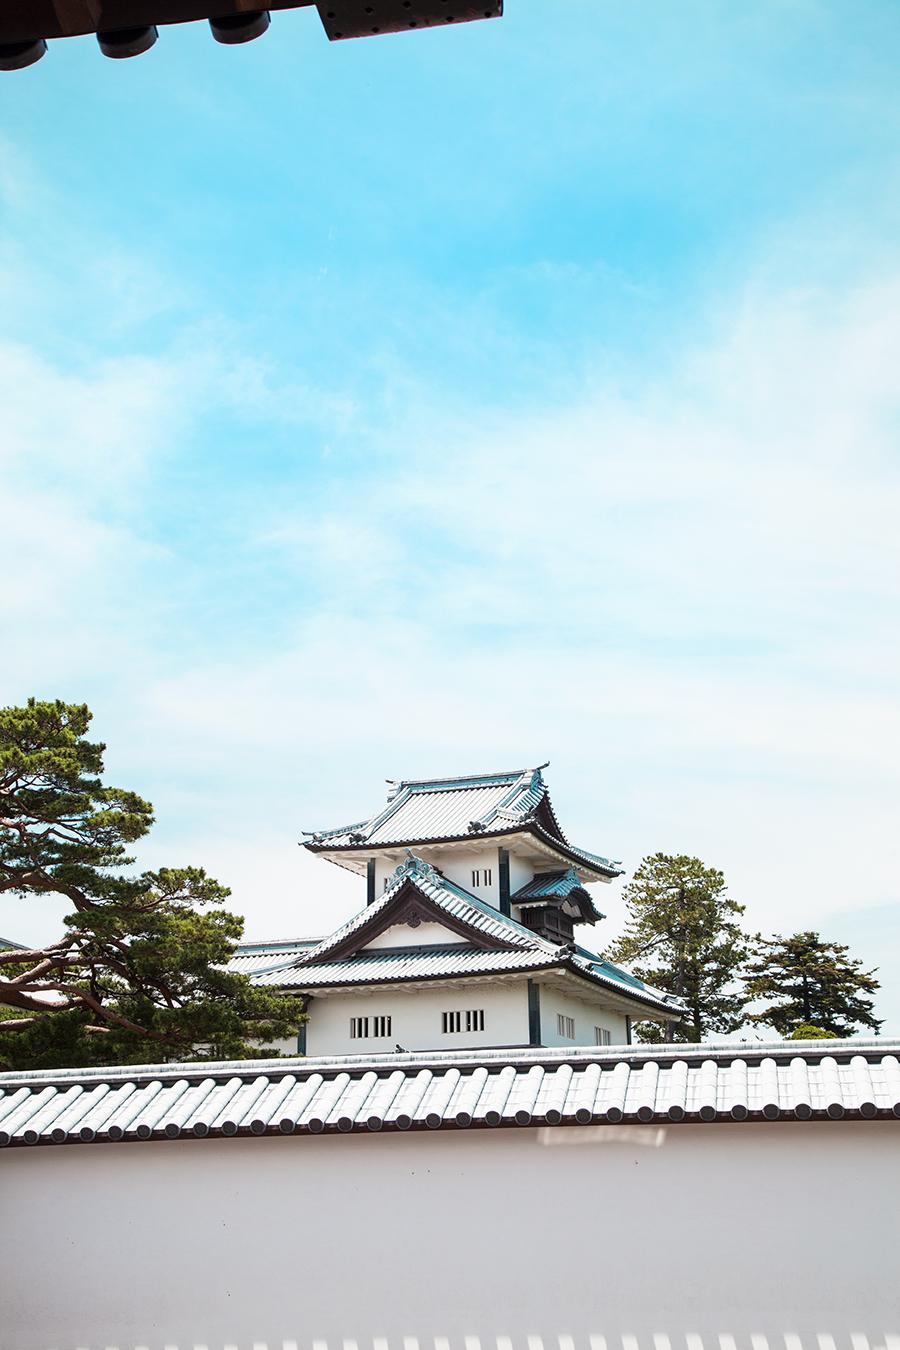 kanazawa castello imperiale